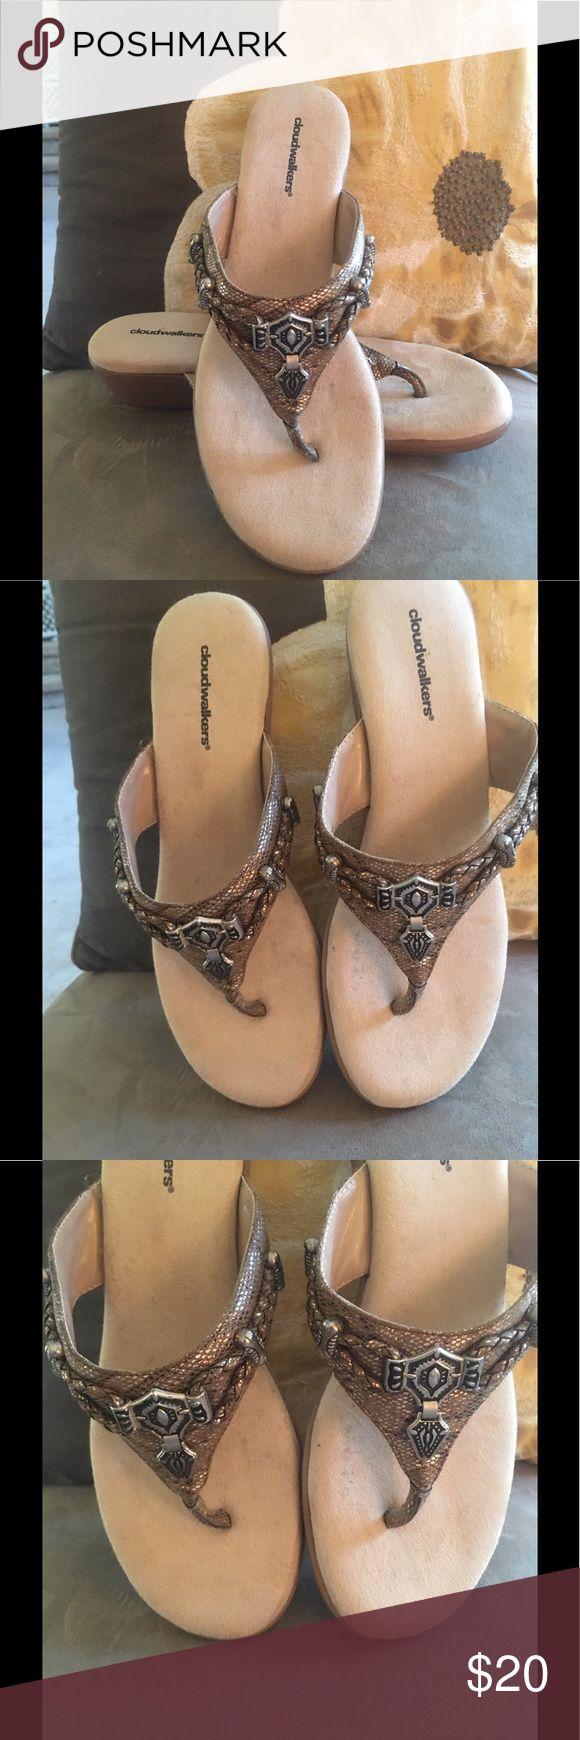 👡 Cloudwalker by Avenue Gold metallic flip flop Gold Metallic flip flop with rubber sole. Avenue Shoes Sandals